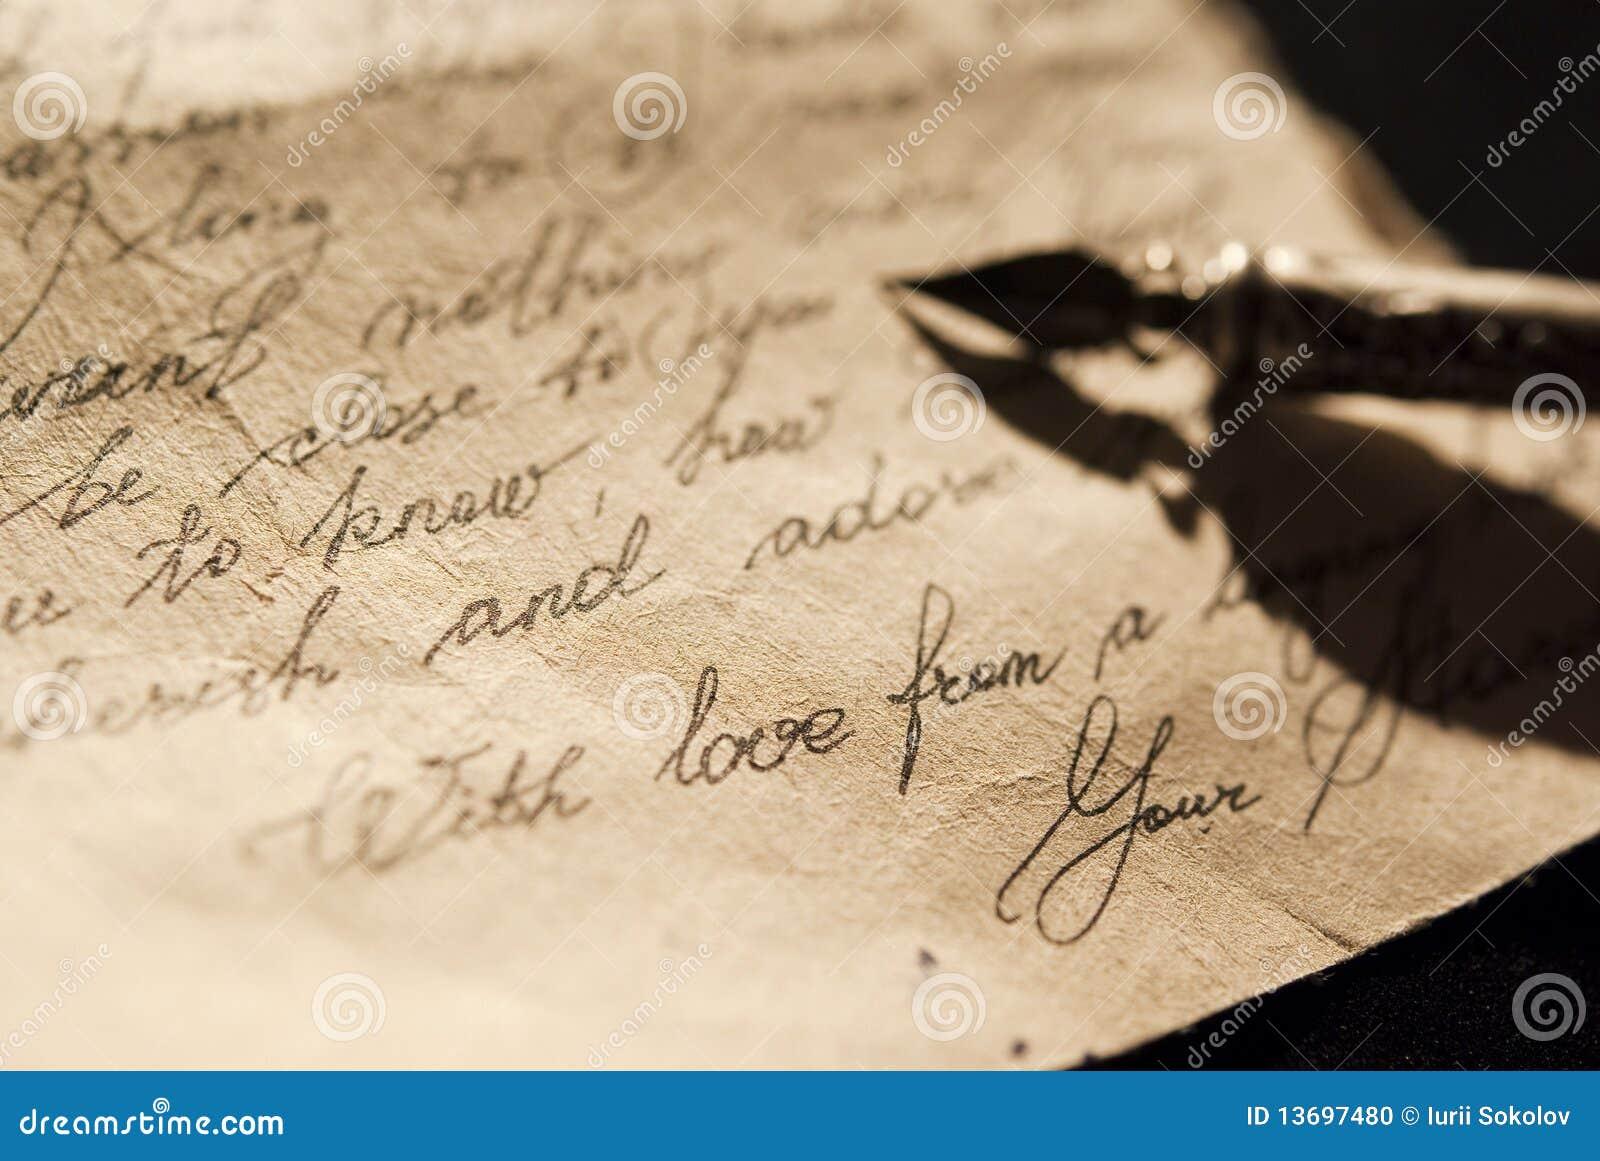 Vieja carta de amor